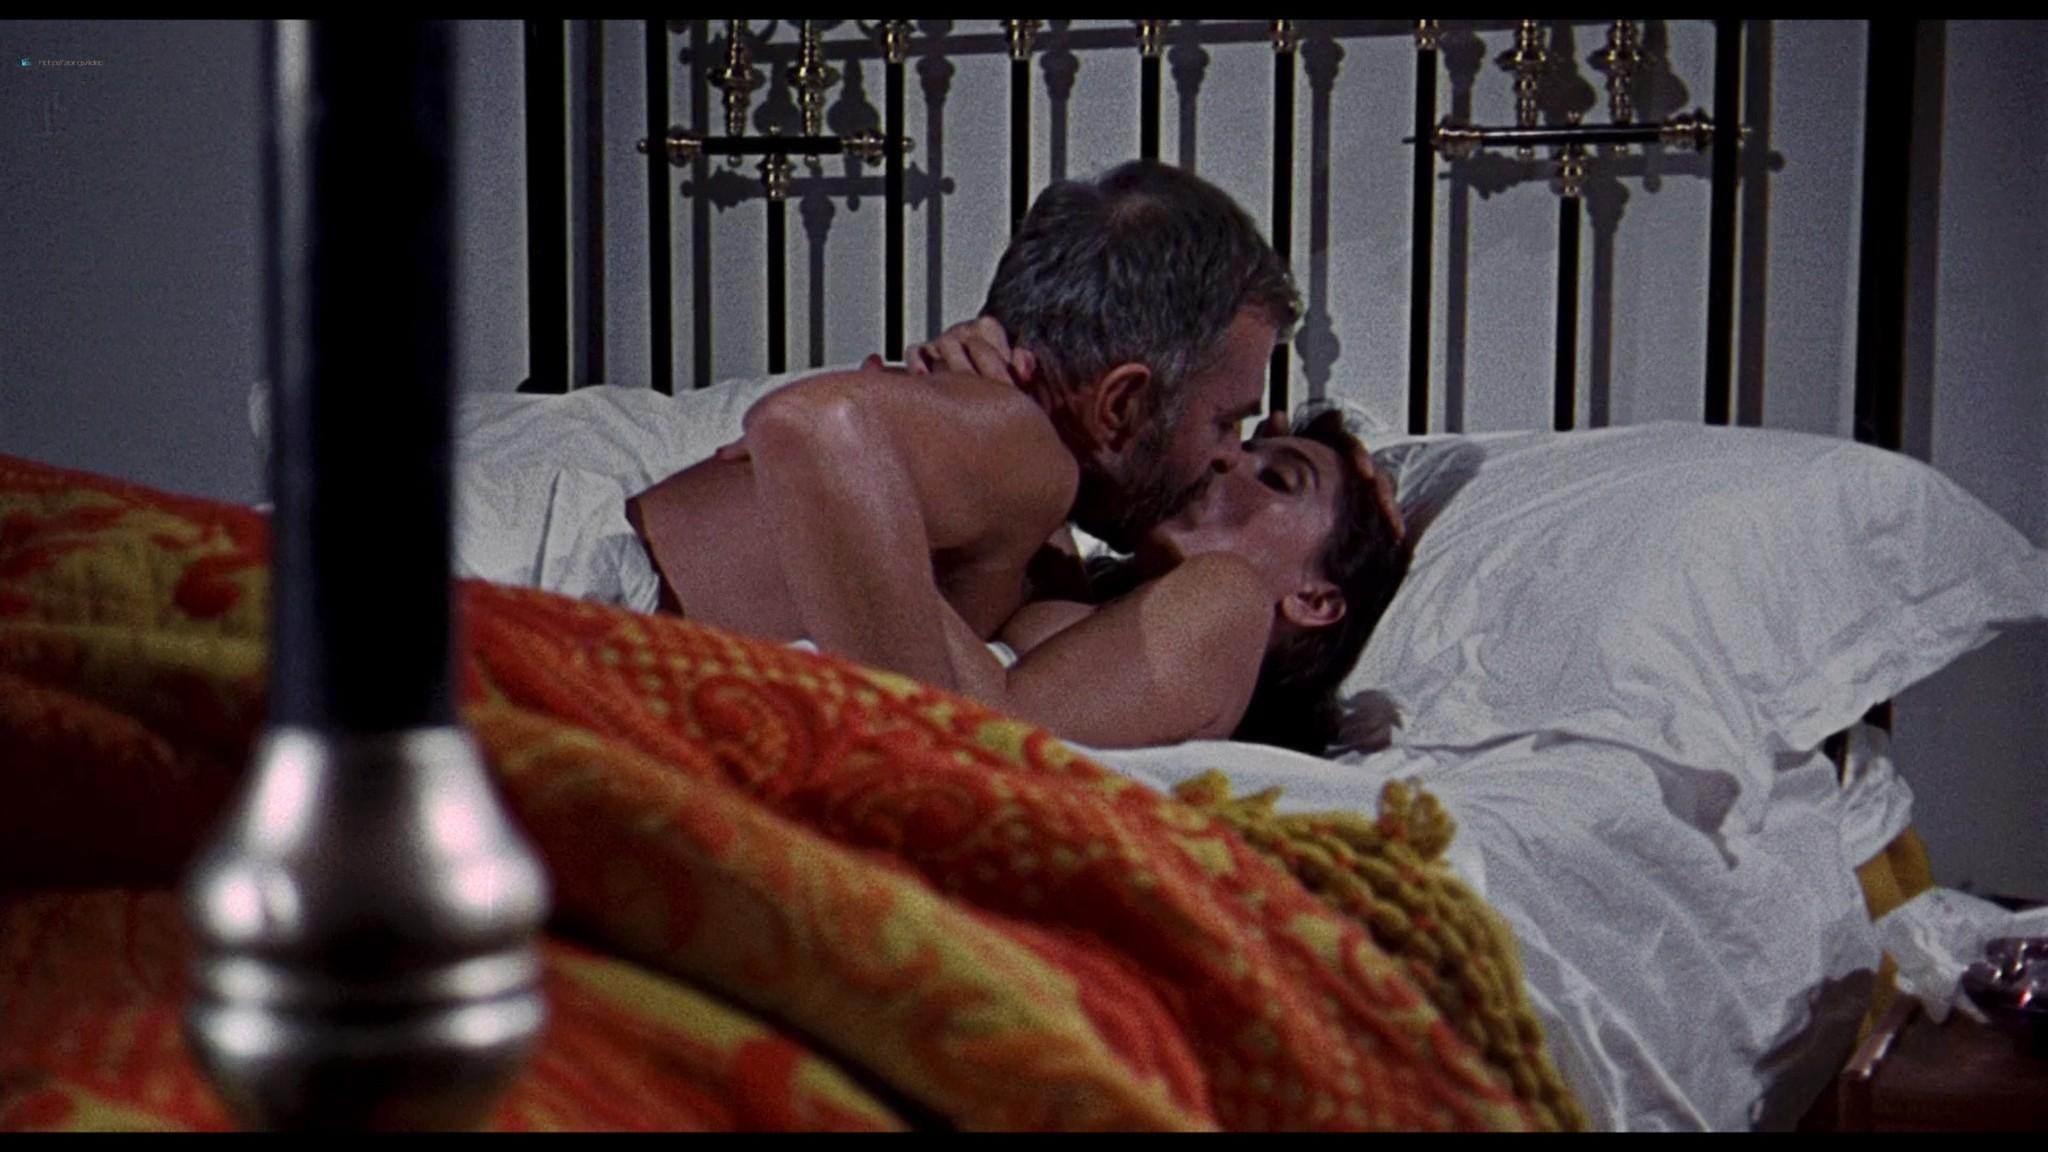 Helen Mirren nude skinny dipping Clarissa Kaye-Mason nude sex - Age of Consent (1969) HD 1080p BluRay Remux (20)